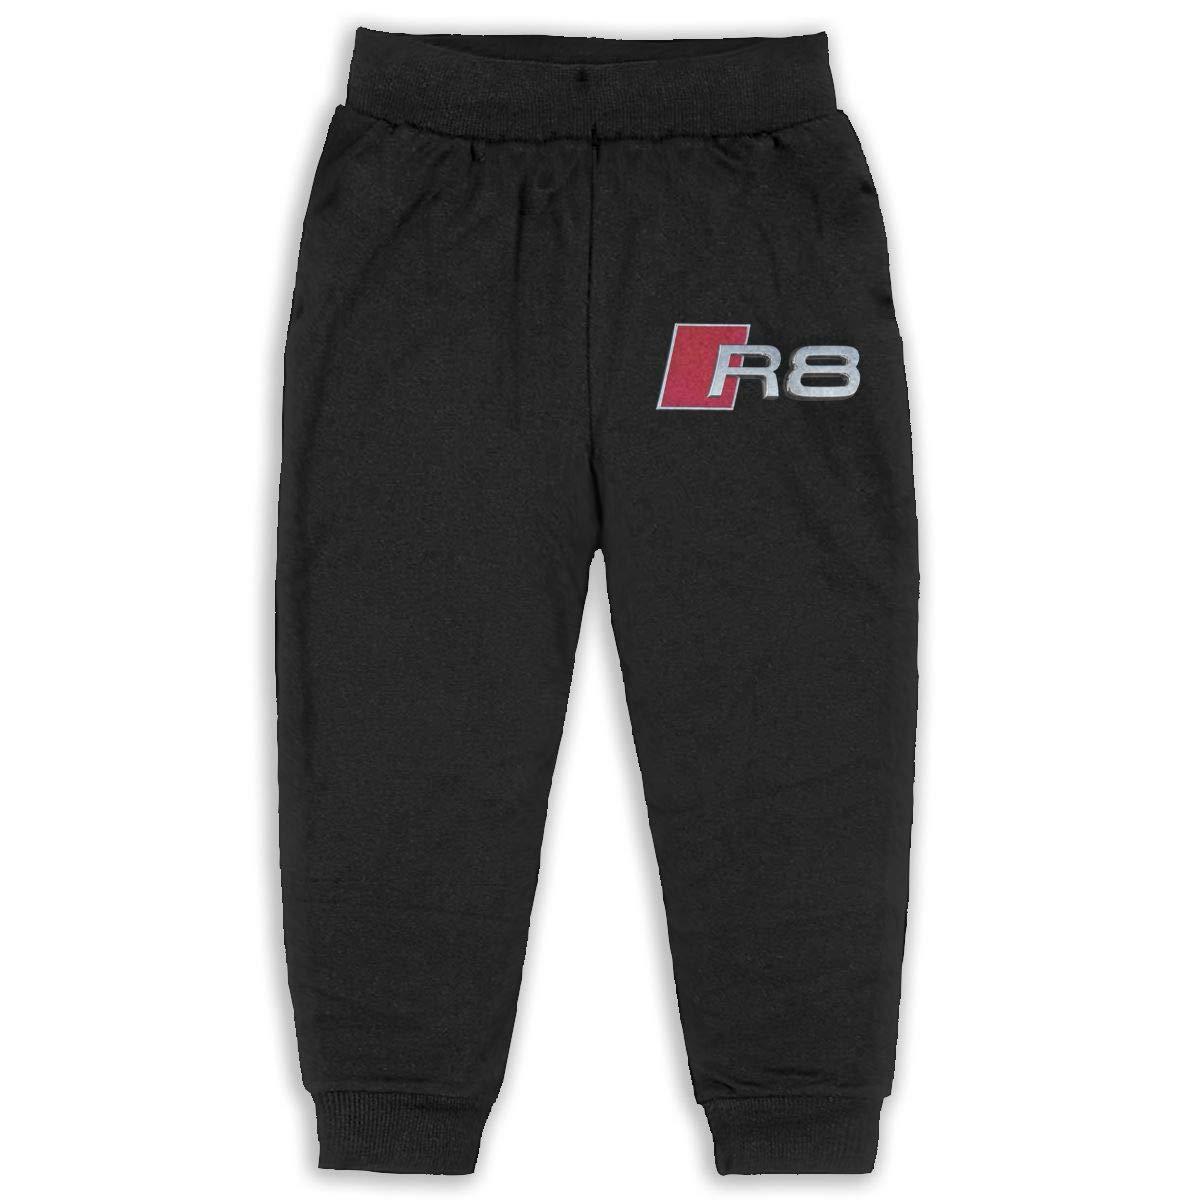 NEST-Homer Childrens Sweatpants R8 Sports Car Boys and Girls Jogger Long Pants Sweatpants Leggings